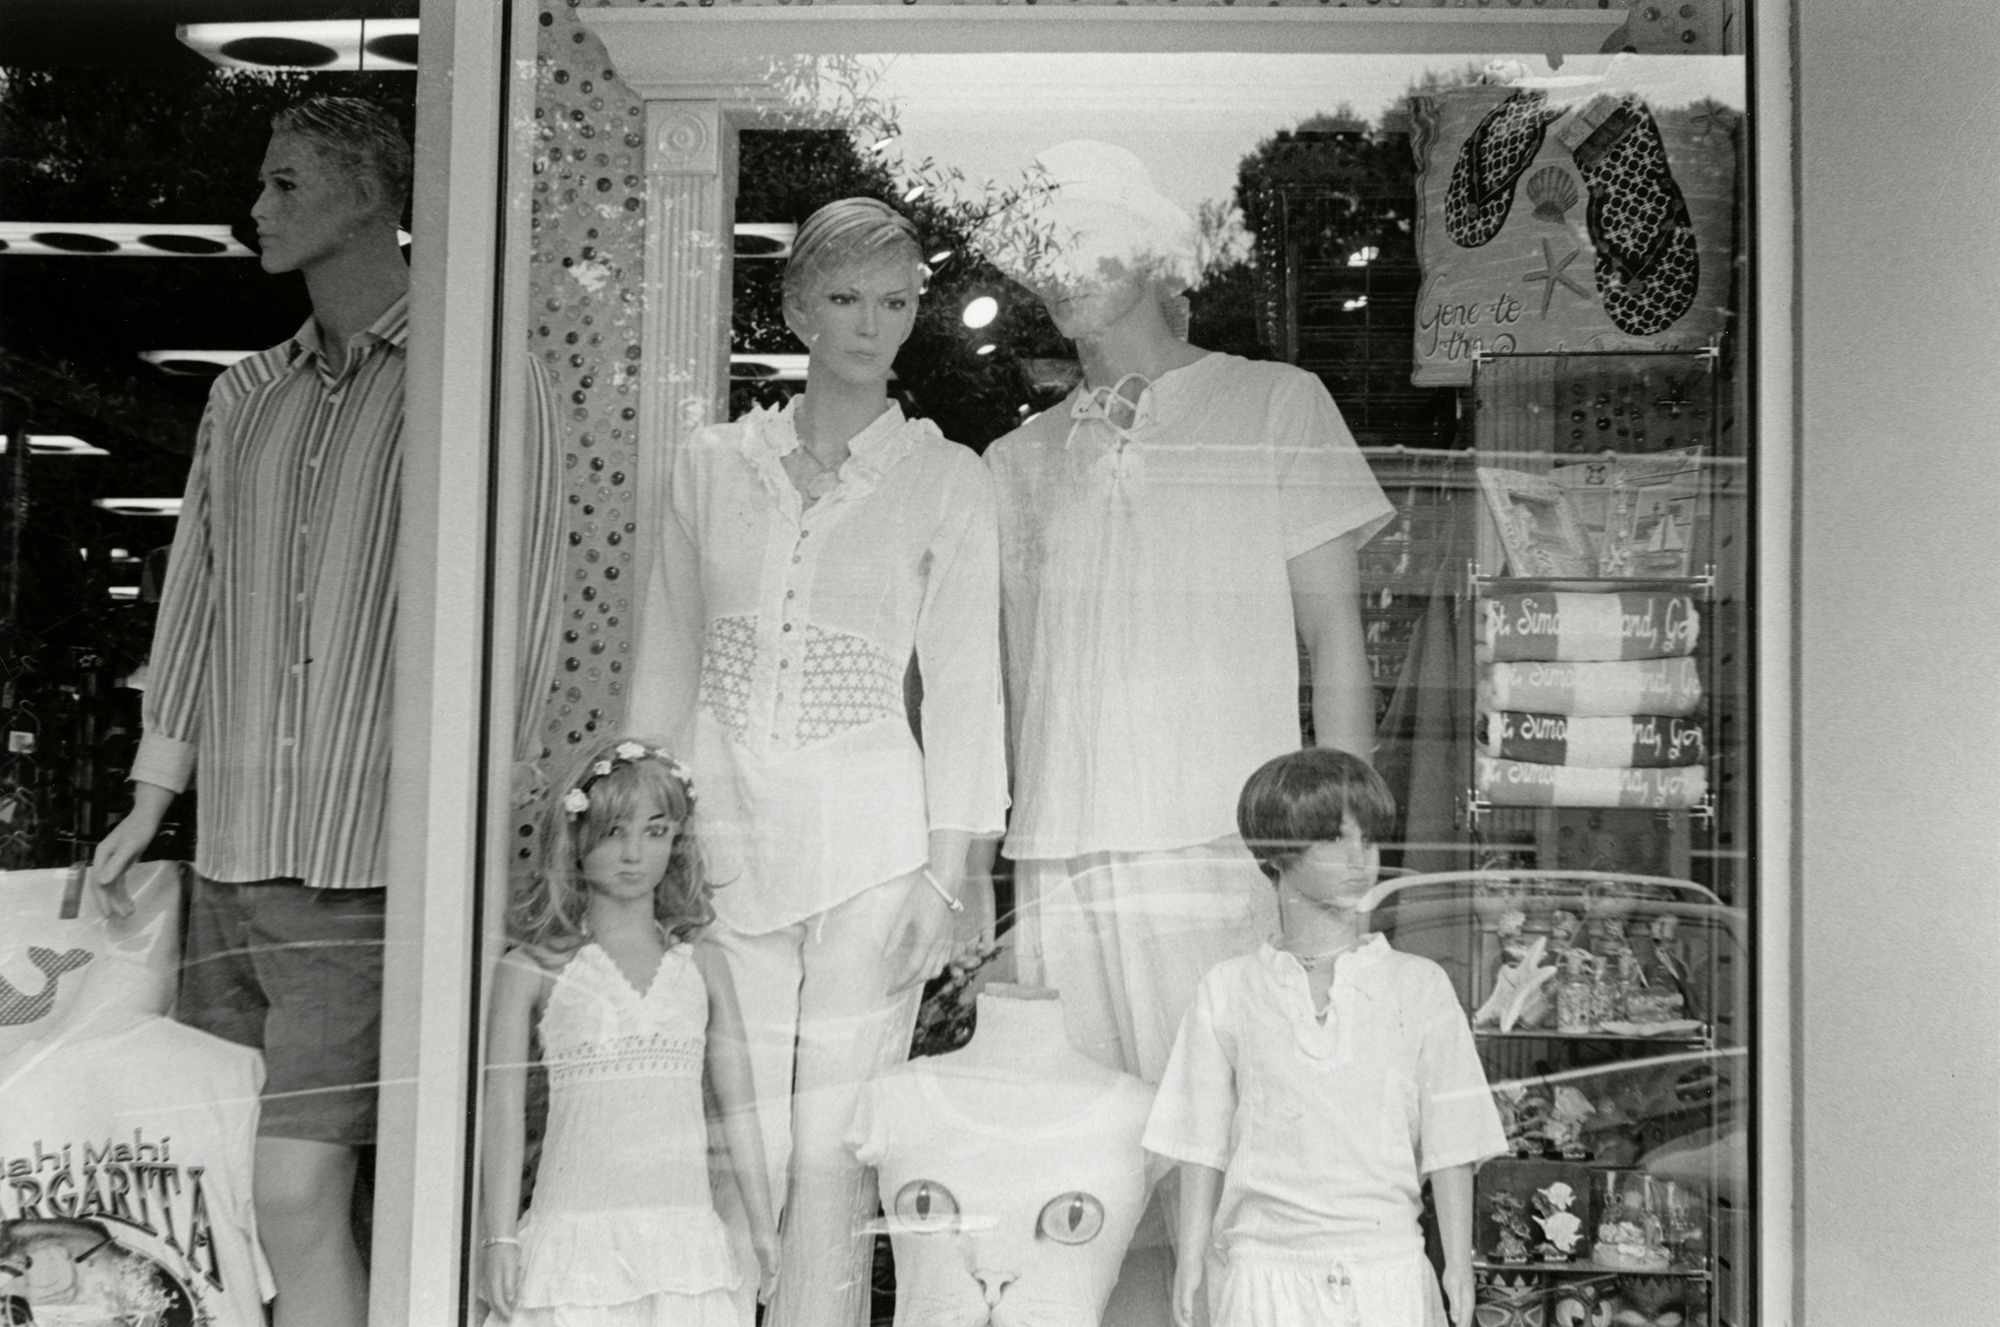 Penelope_Stone-Window_Shopping-7.jpg